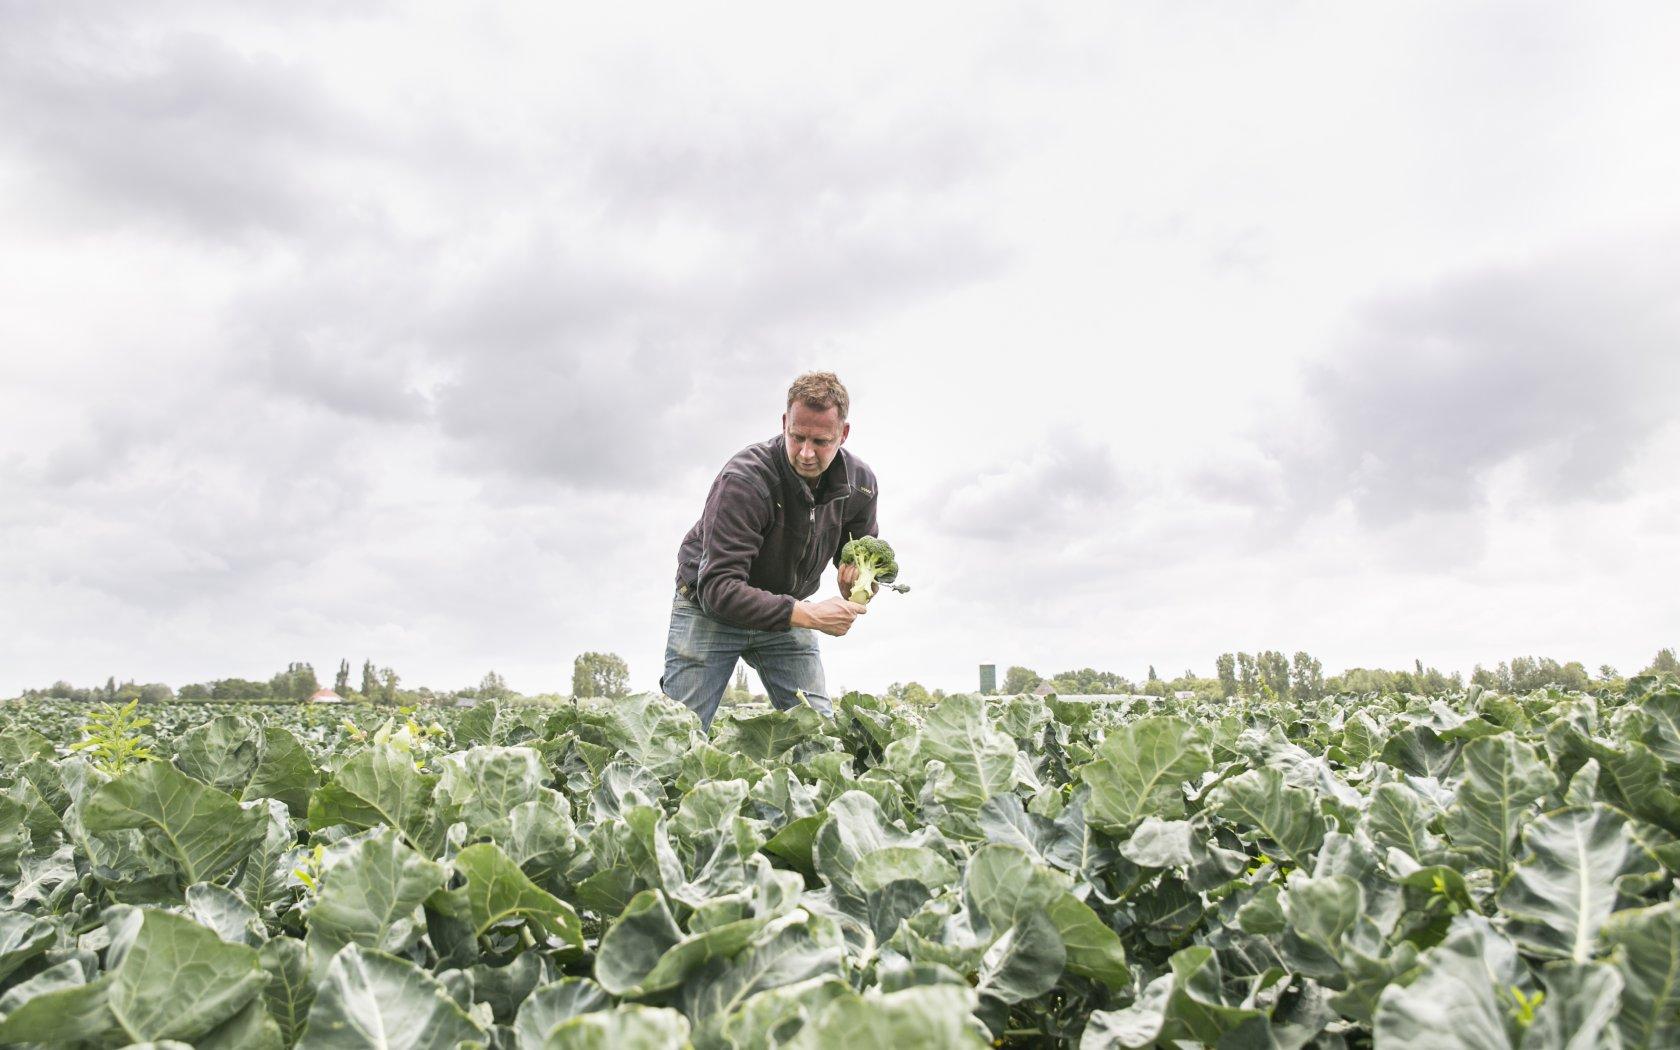 Eerste Nederlandse broccoli geoogst